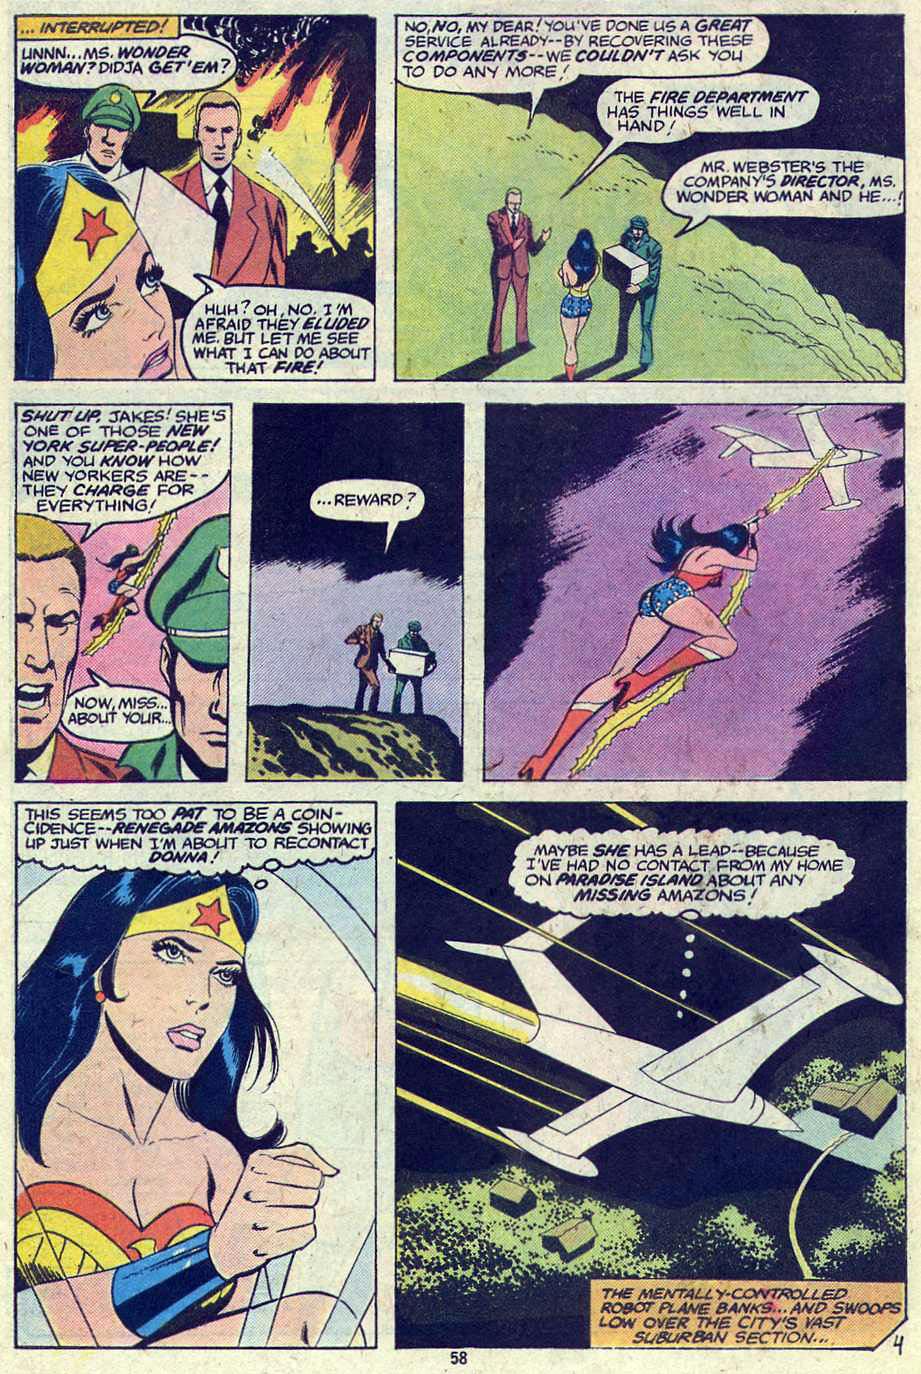 Read online Adventure Comics (1938) comic -  Issue #461 - 58